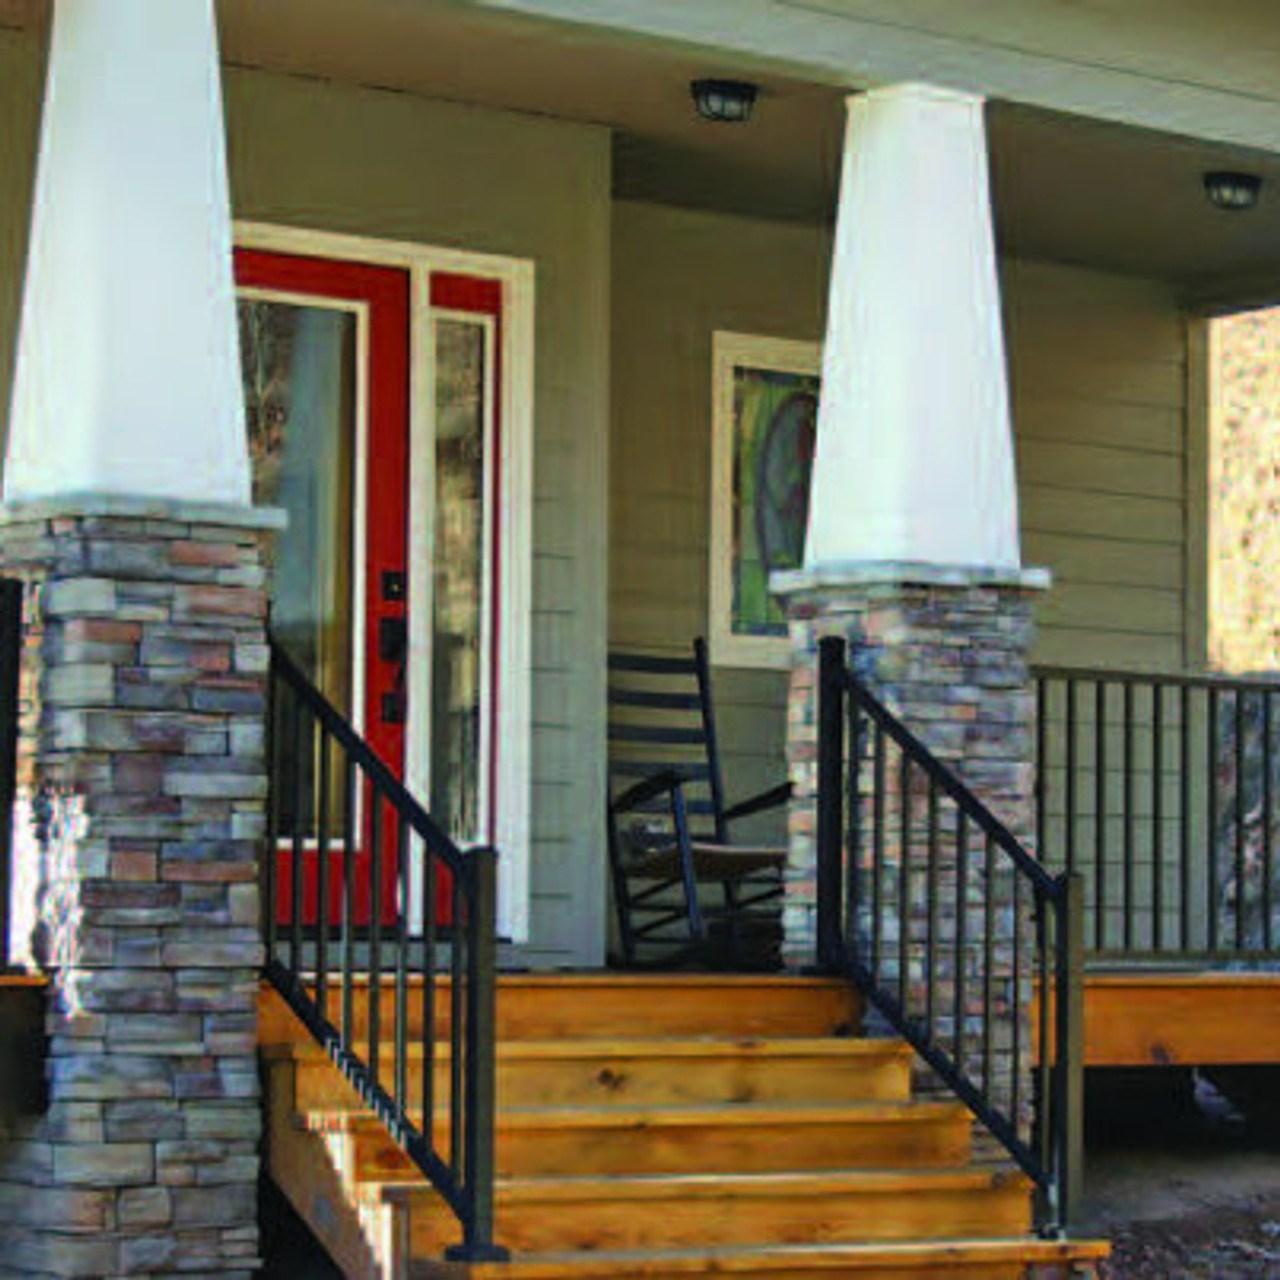 Westbury Tuscany Aluminum Stair Railing Kit W Mounts | Aluminum Handrails For Outdoor Steps | Wrought Iron Railings | Baluster | Staircase | Freedom | Powder Coated Aluminum